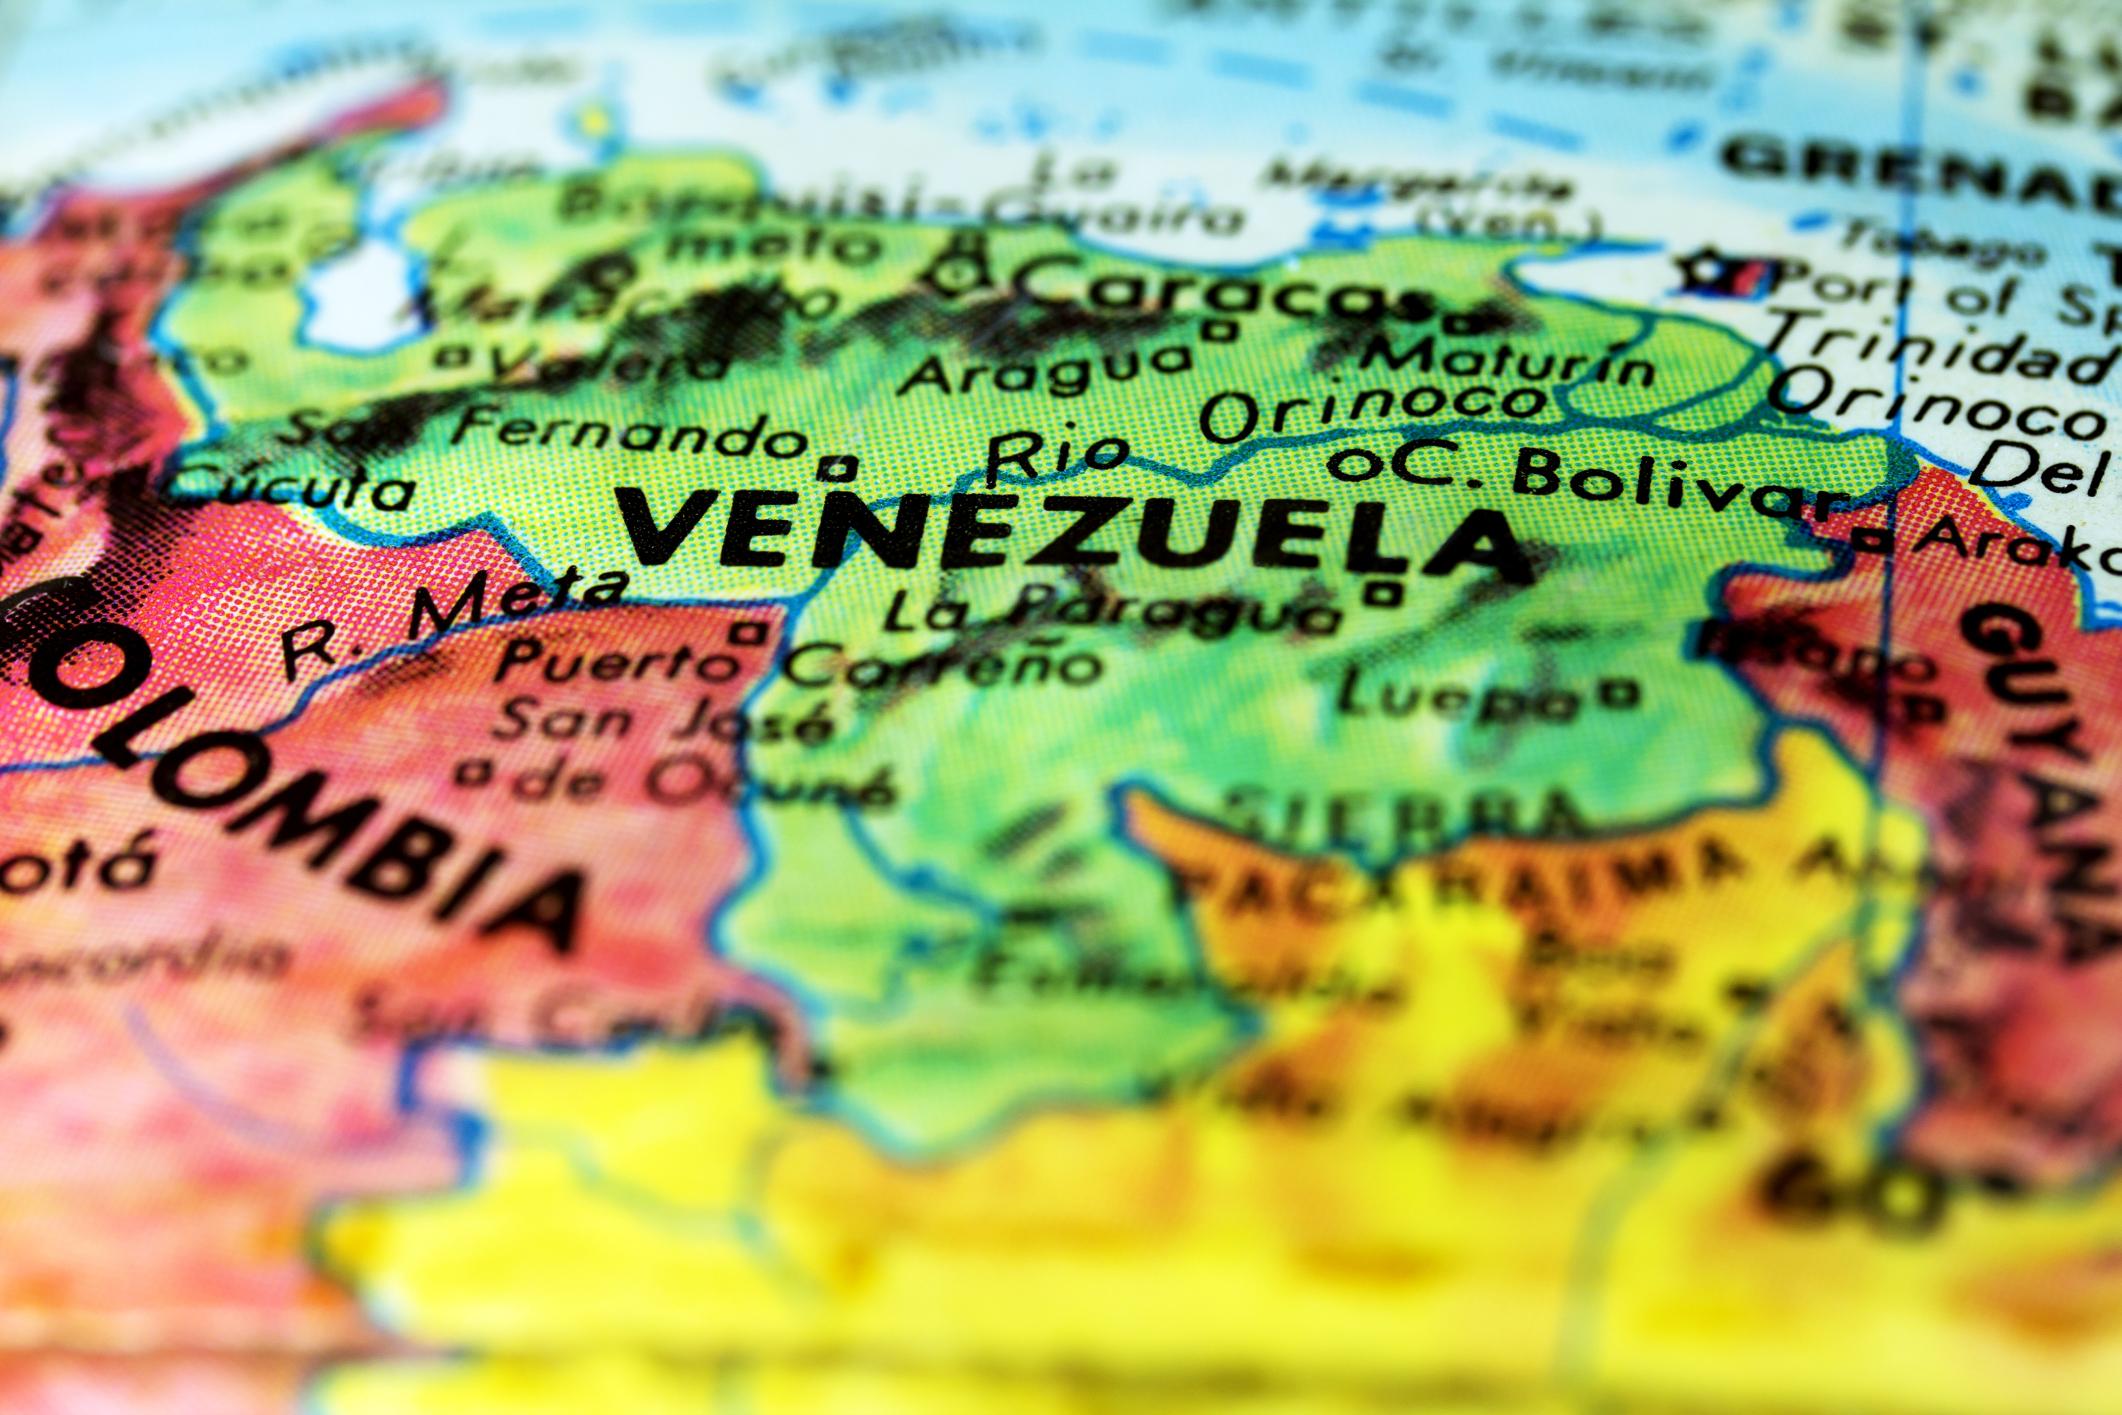 پایان پوپولیسم در ونزوئلا